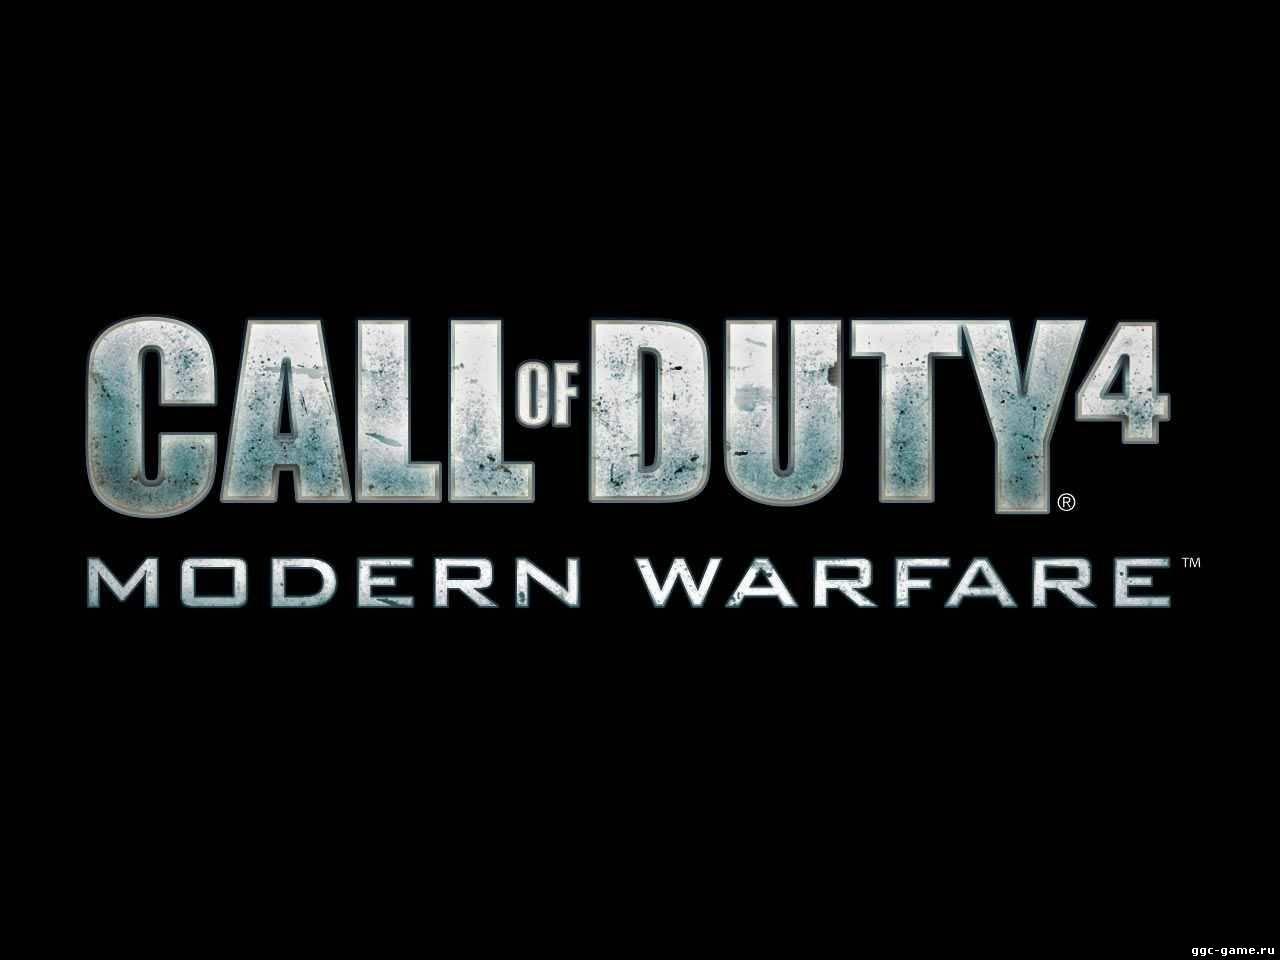 Патч 1.6 для Call of Duty 4 Moder Warfare.